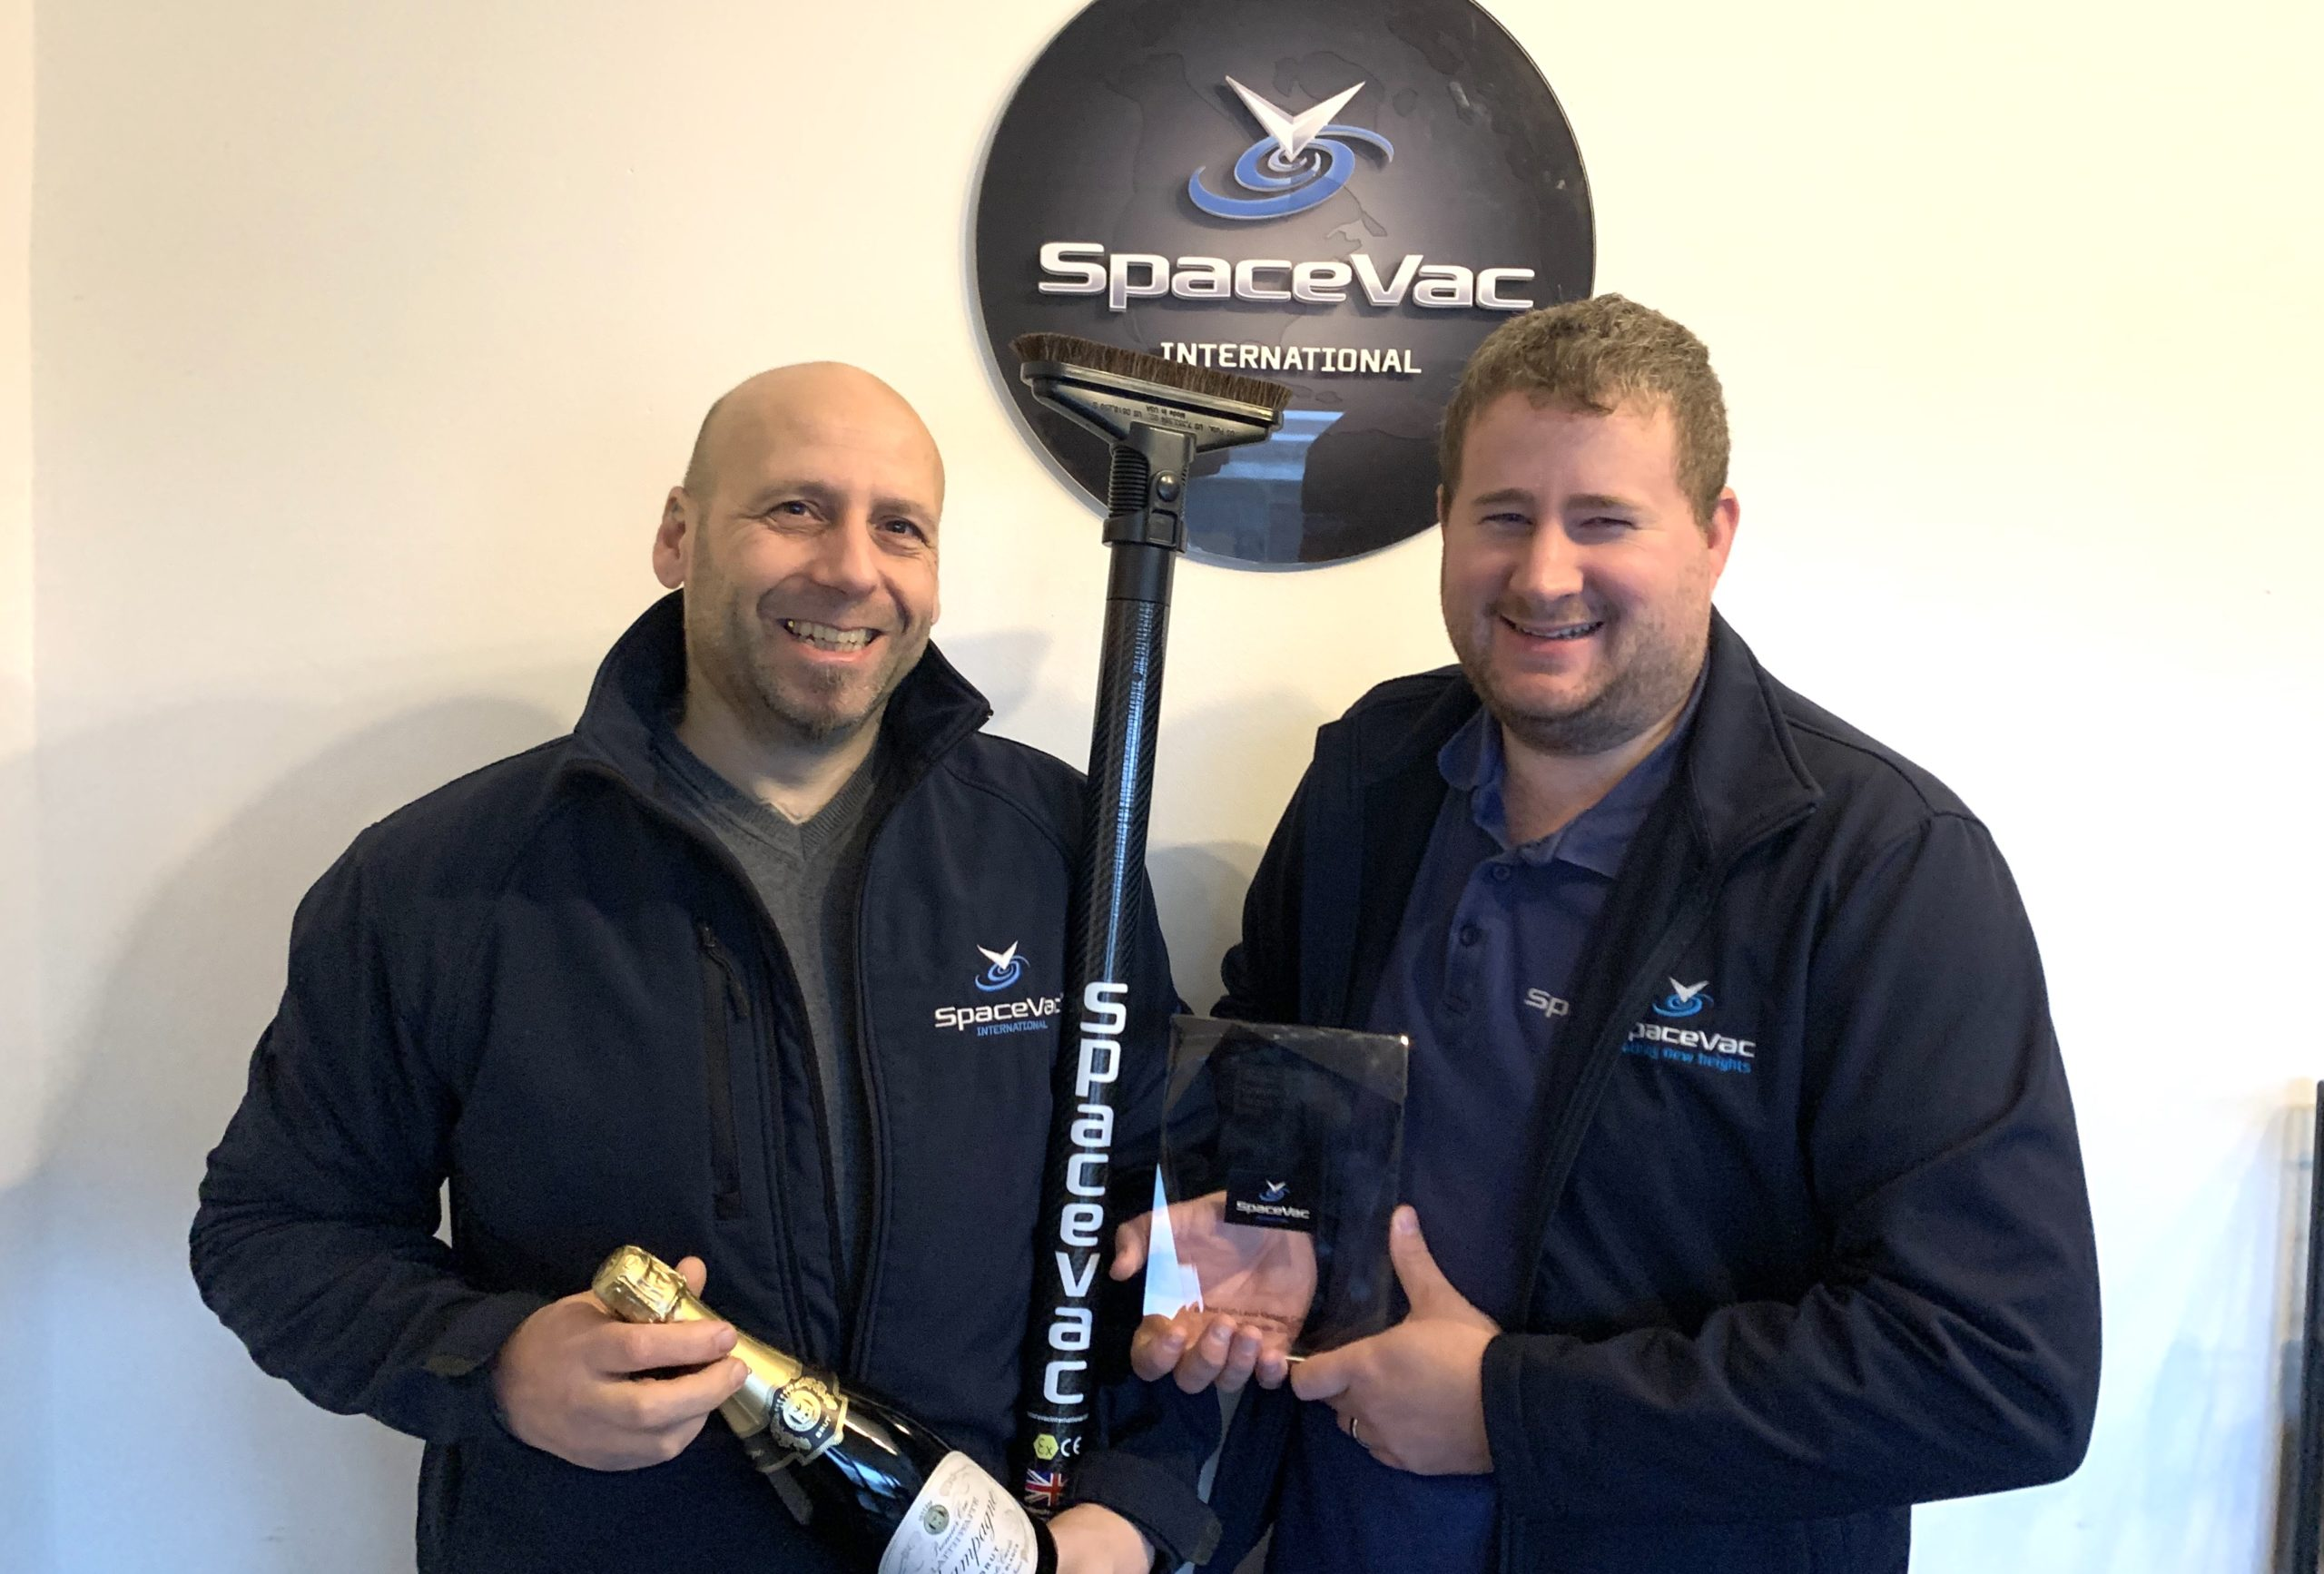 Spacevac Team